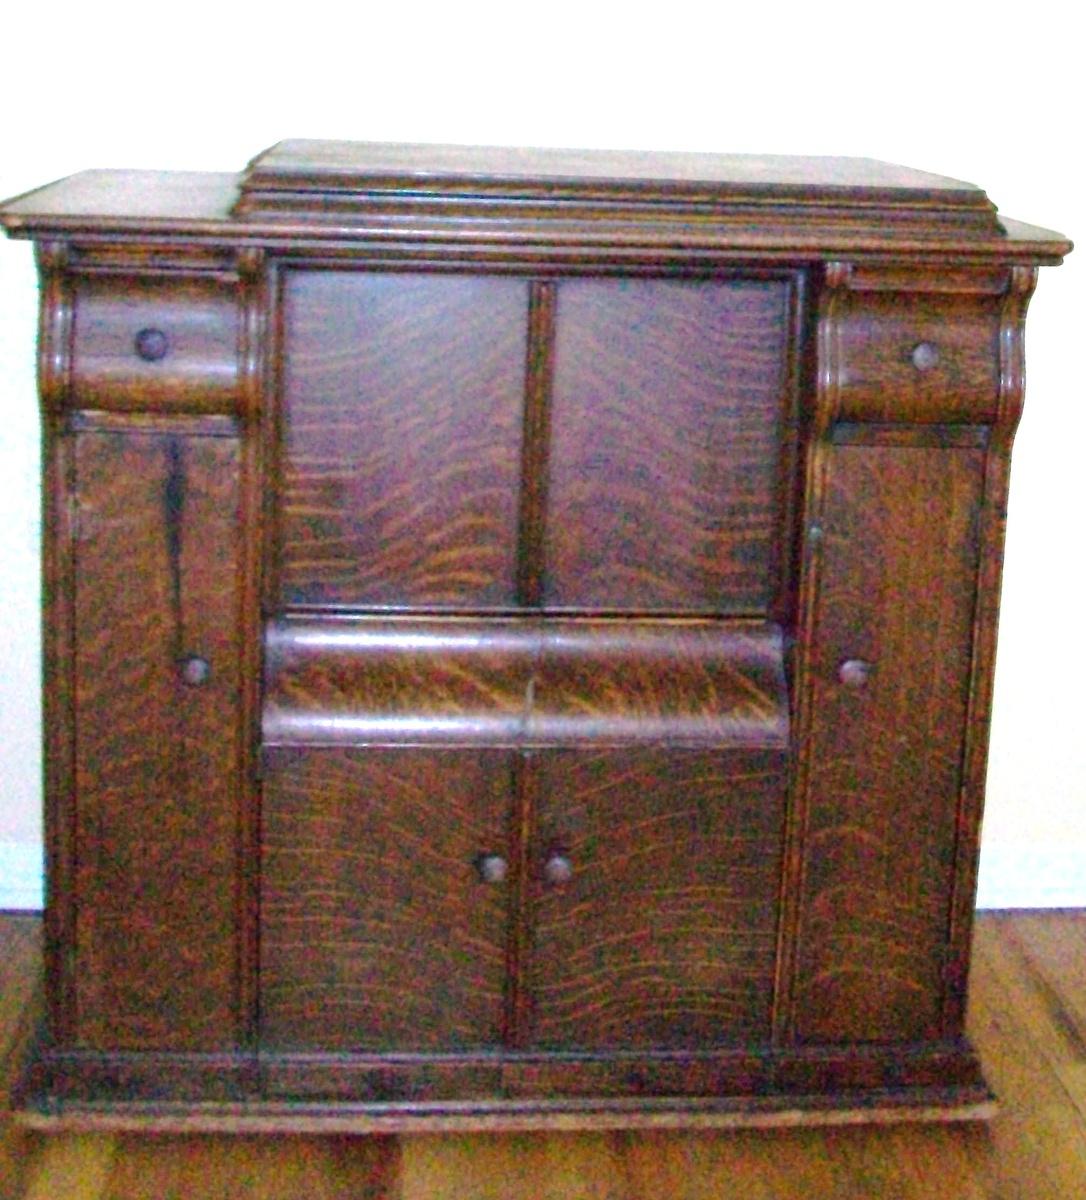 1910 working Singer sewing machine with original wooden case